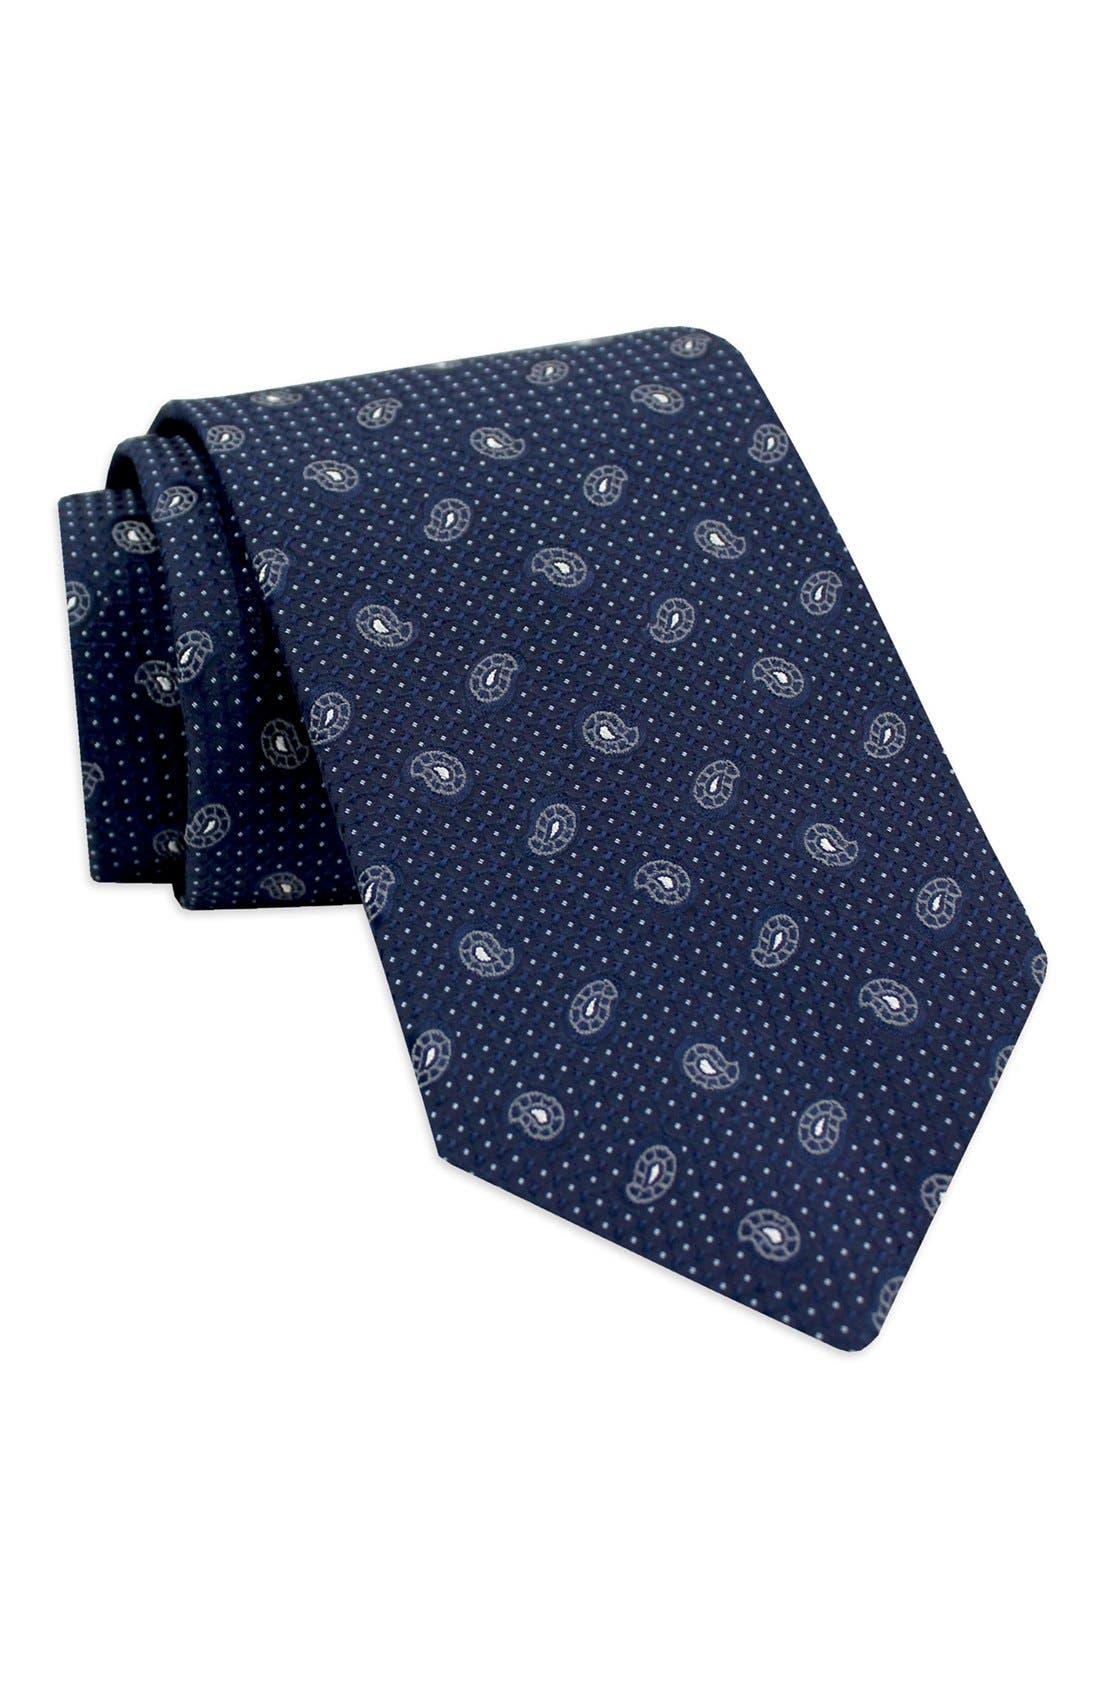 Alternate Image 1 Selected - Gitman Paisley Woven Silk Tie